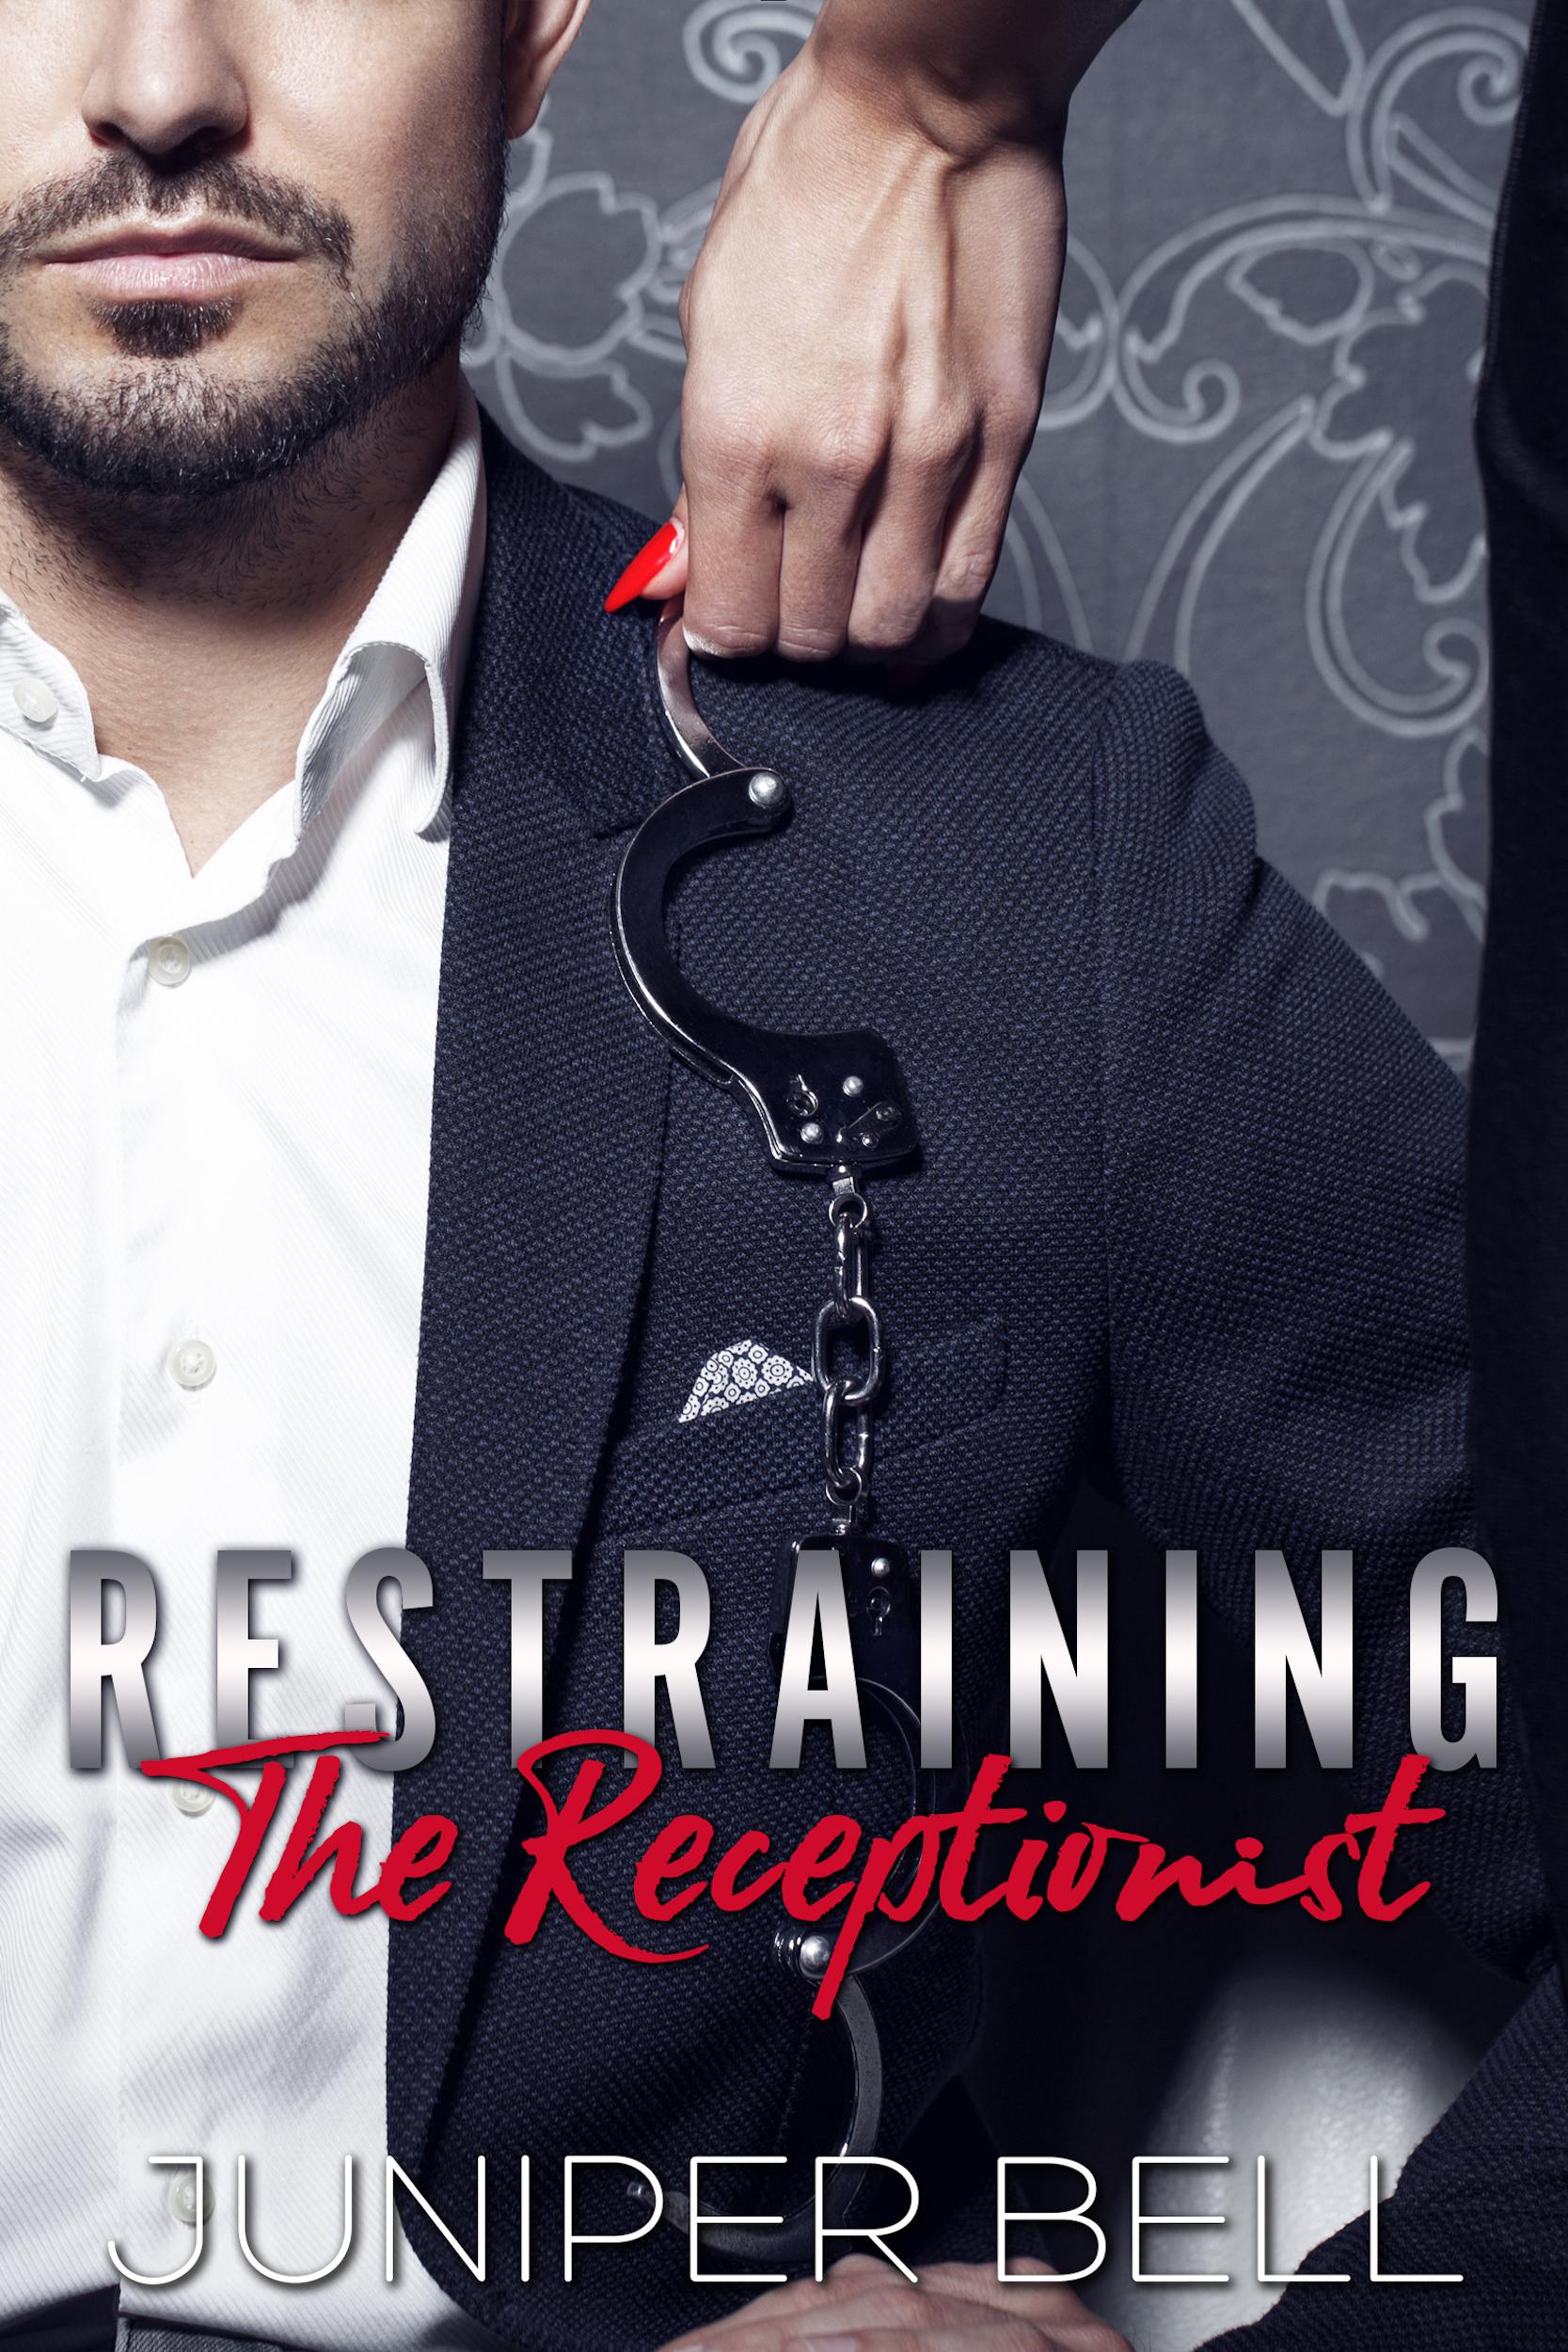 Restraining the Receptionist.2500.jpg